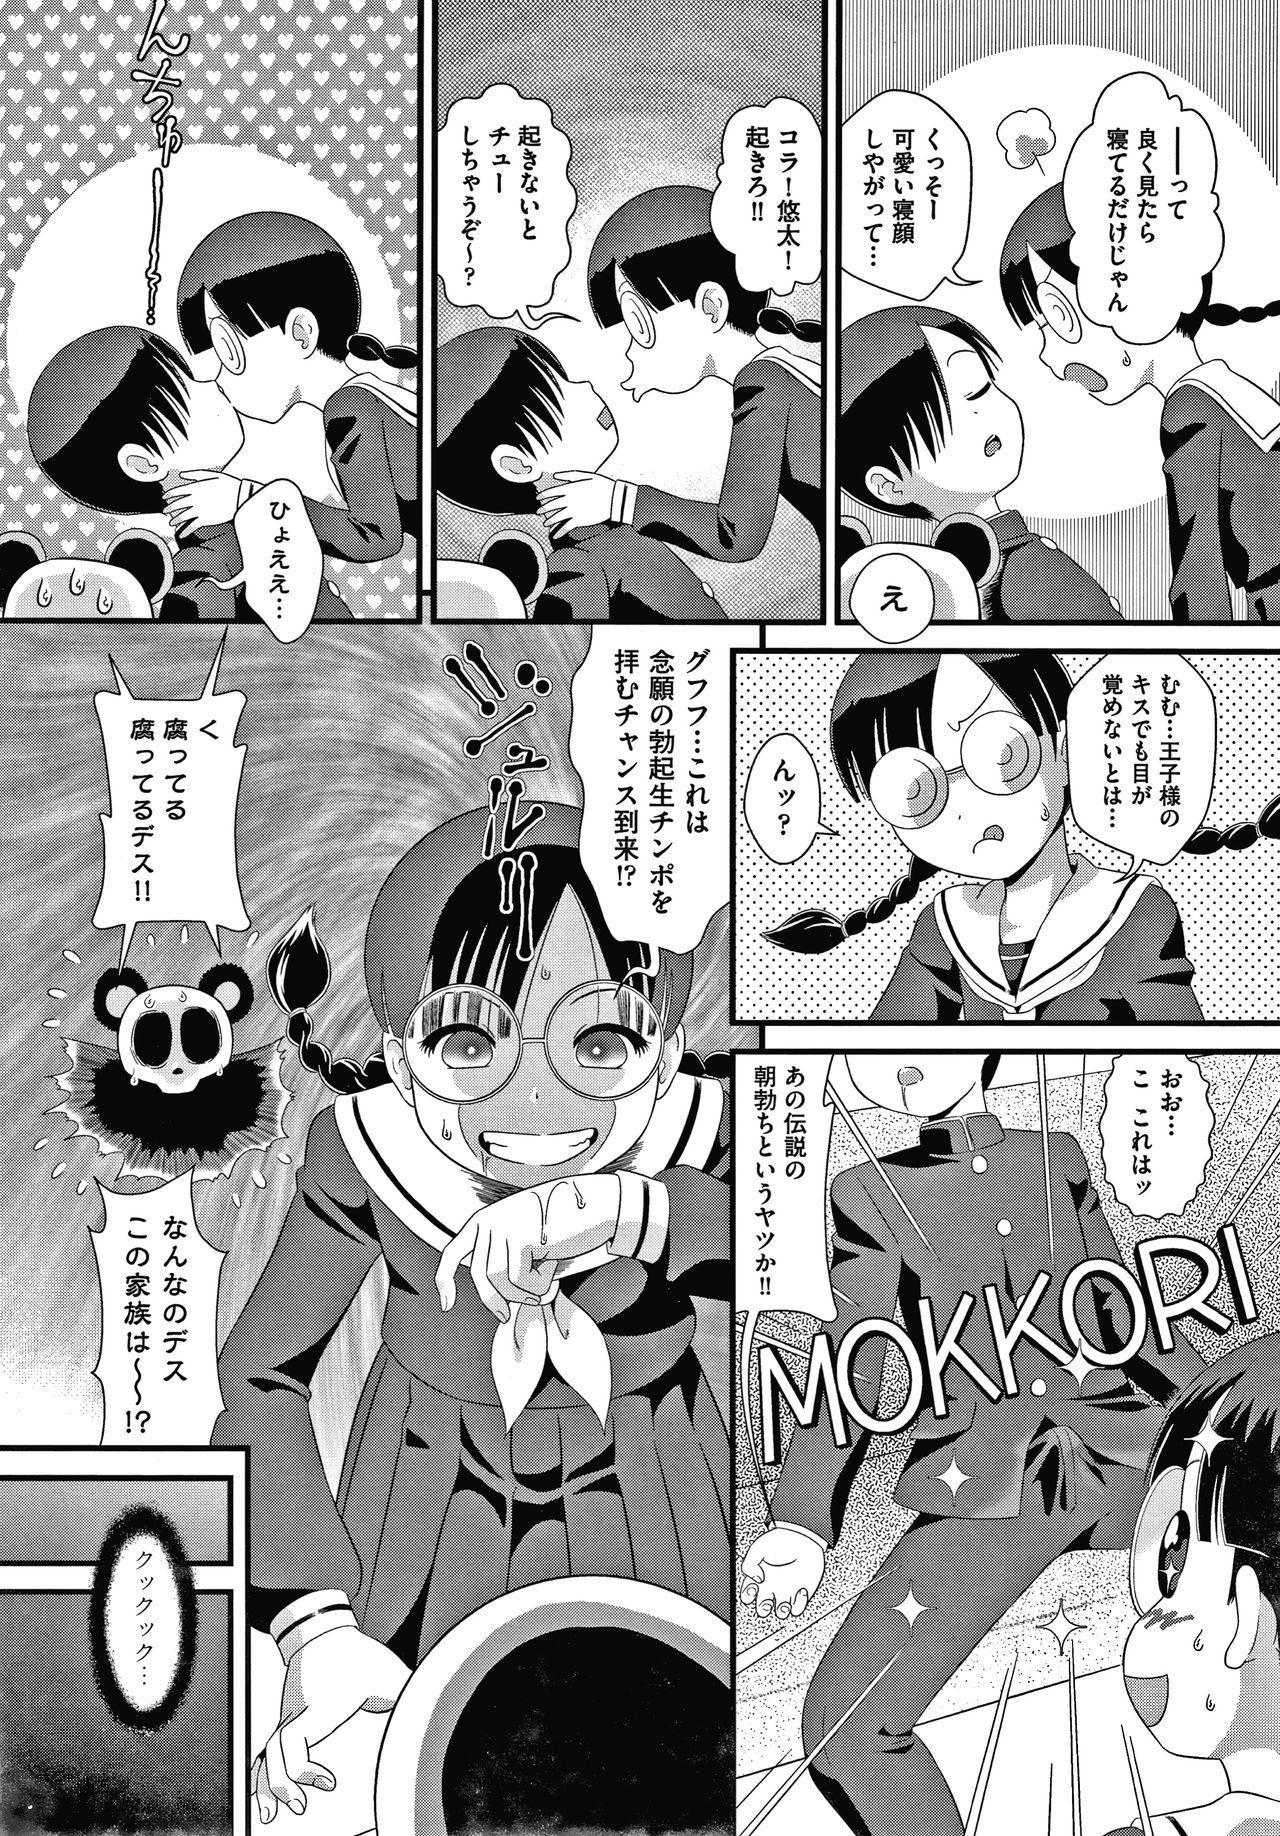 Shoujo Kumikyoku 15 19